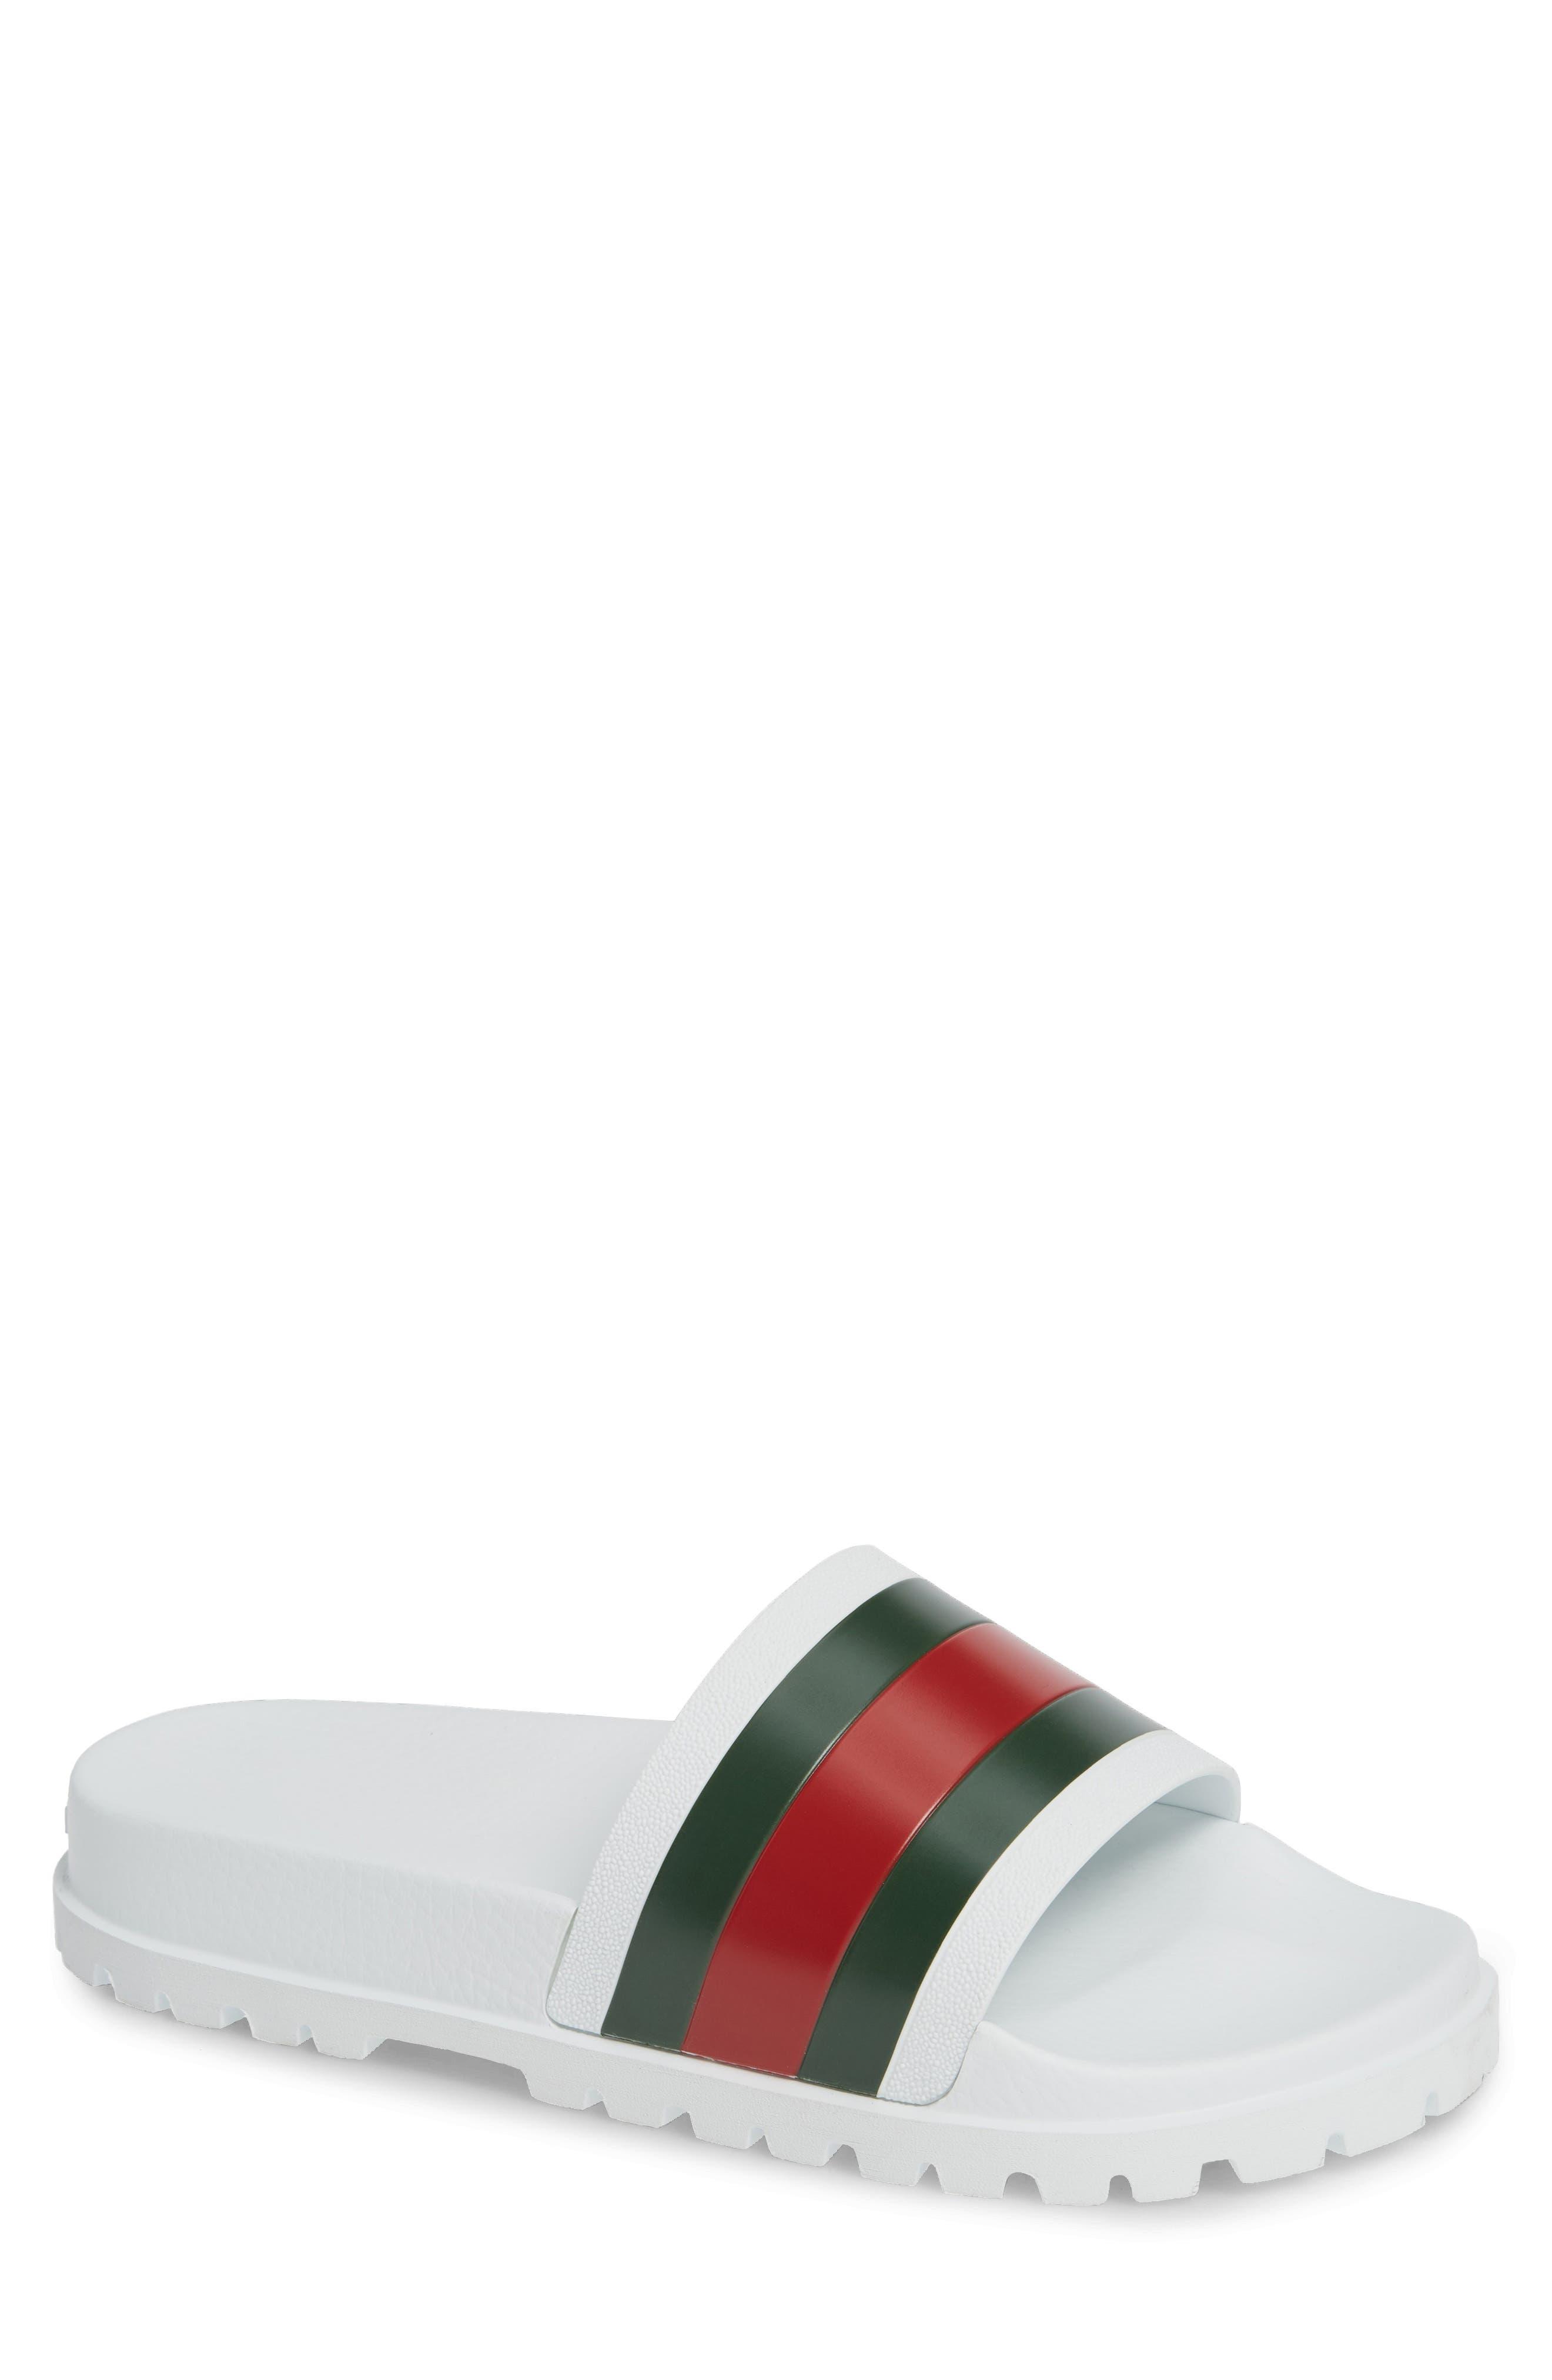 'Pursuit Treck' Slide Sandal,                         Main,                         color, GREAT WHITE